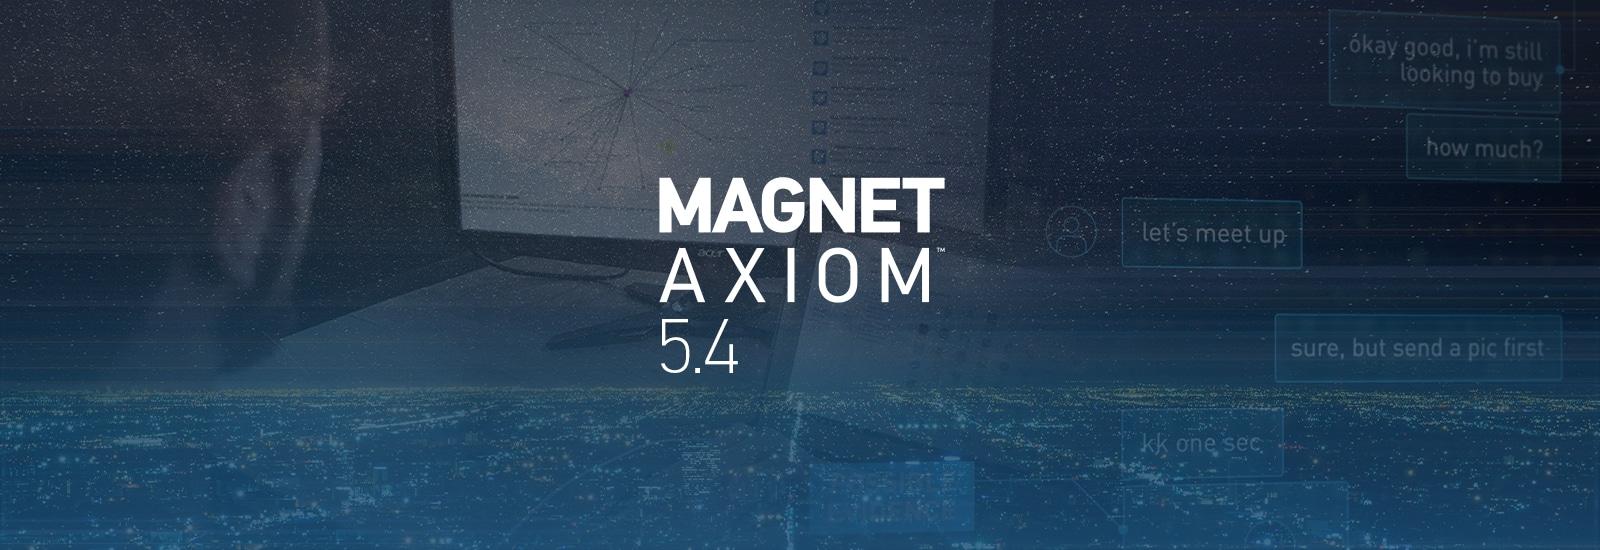 Magnet AXIOM 5.4